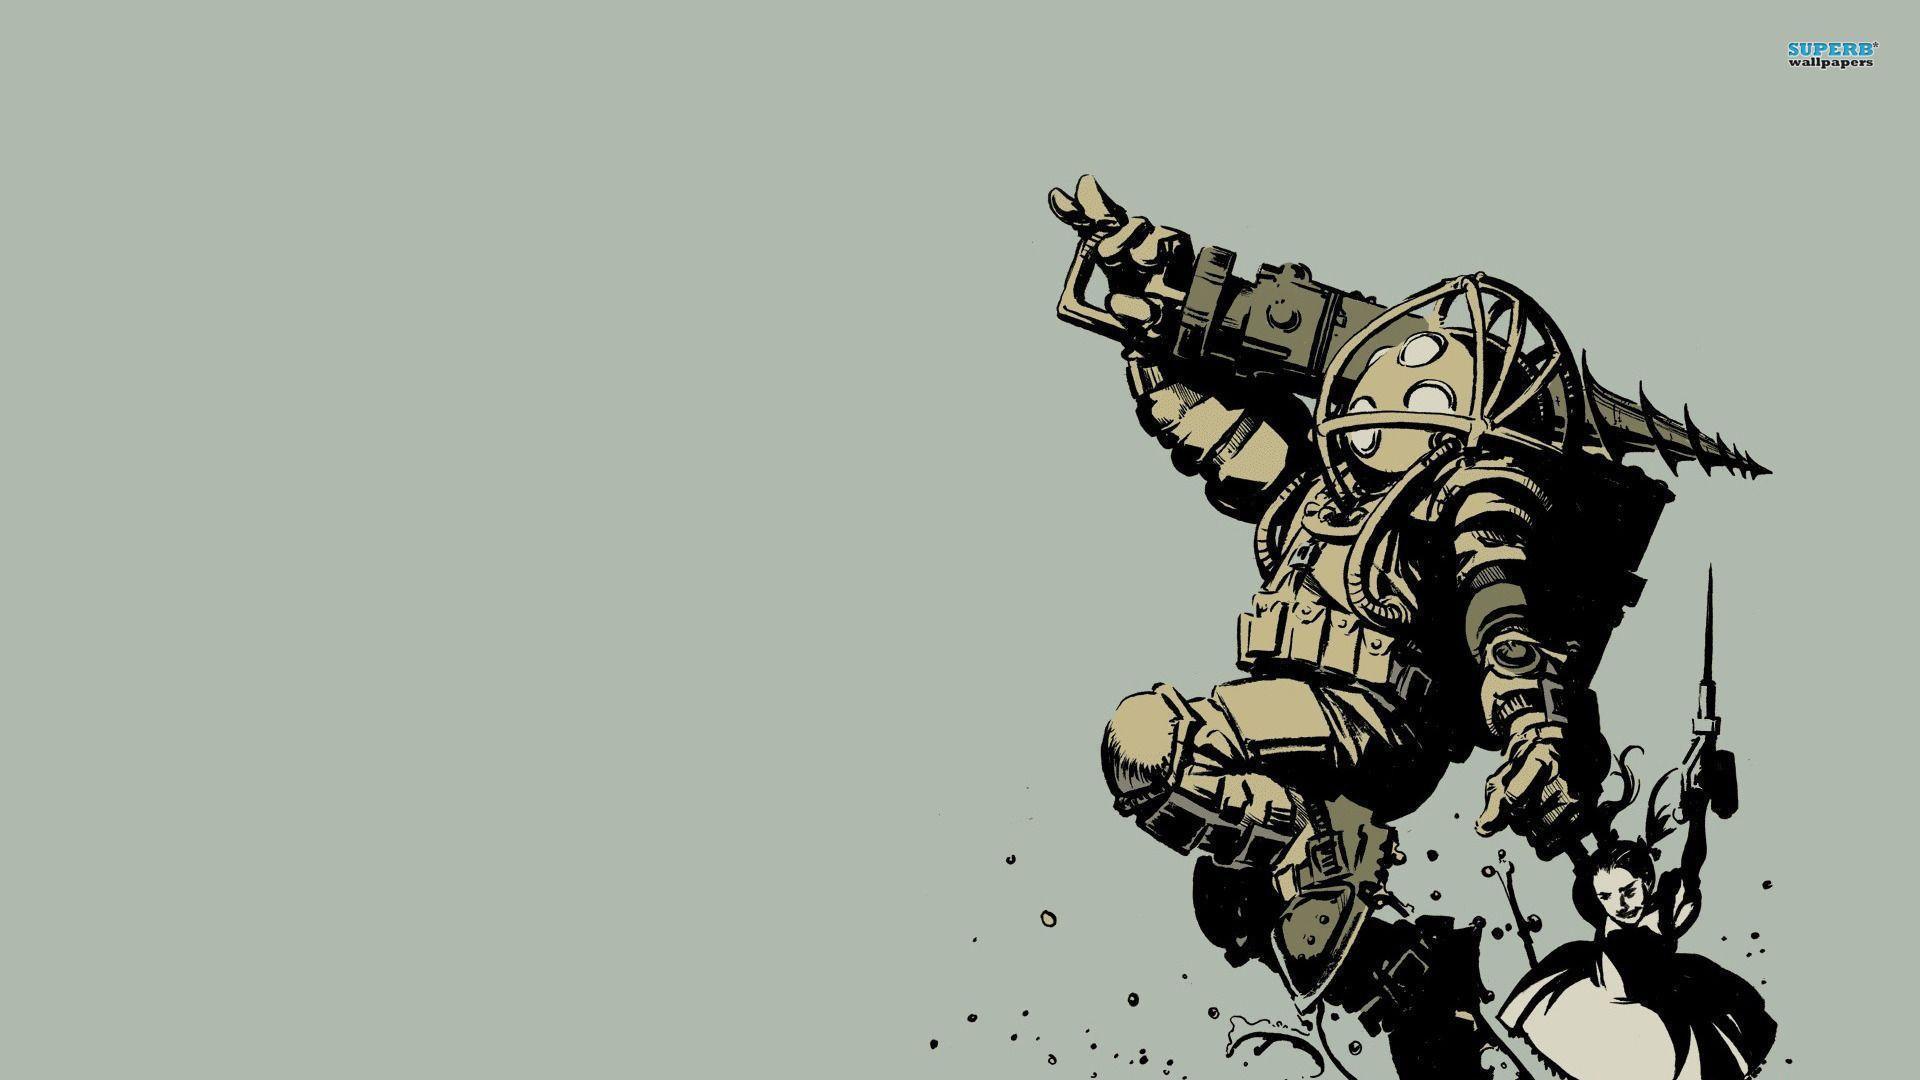 BioShock Infinite Wallpapers 1920x1080  Wallpaper Cave